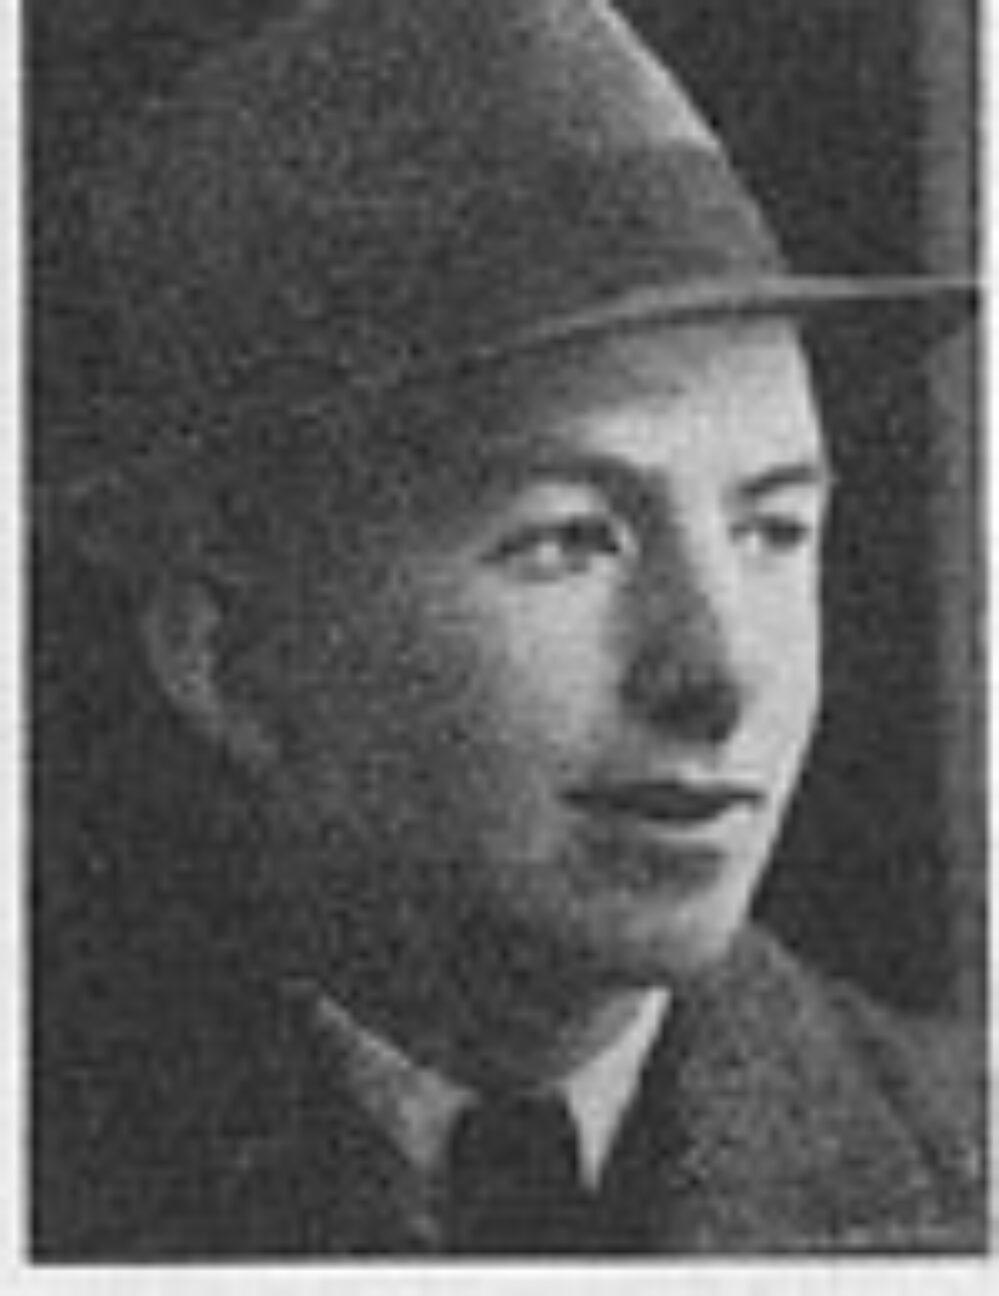 Johan Oluf Bransvik